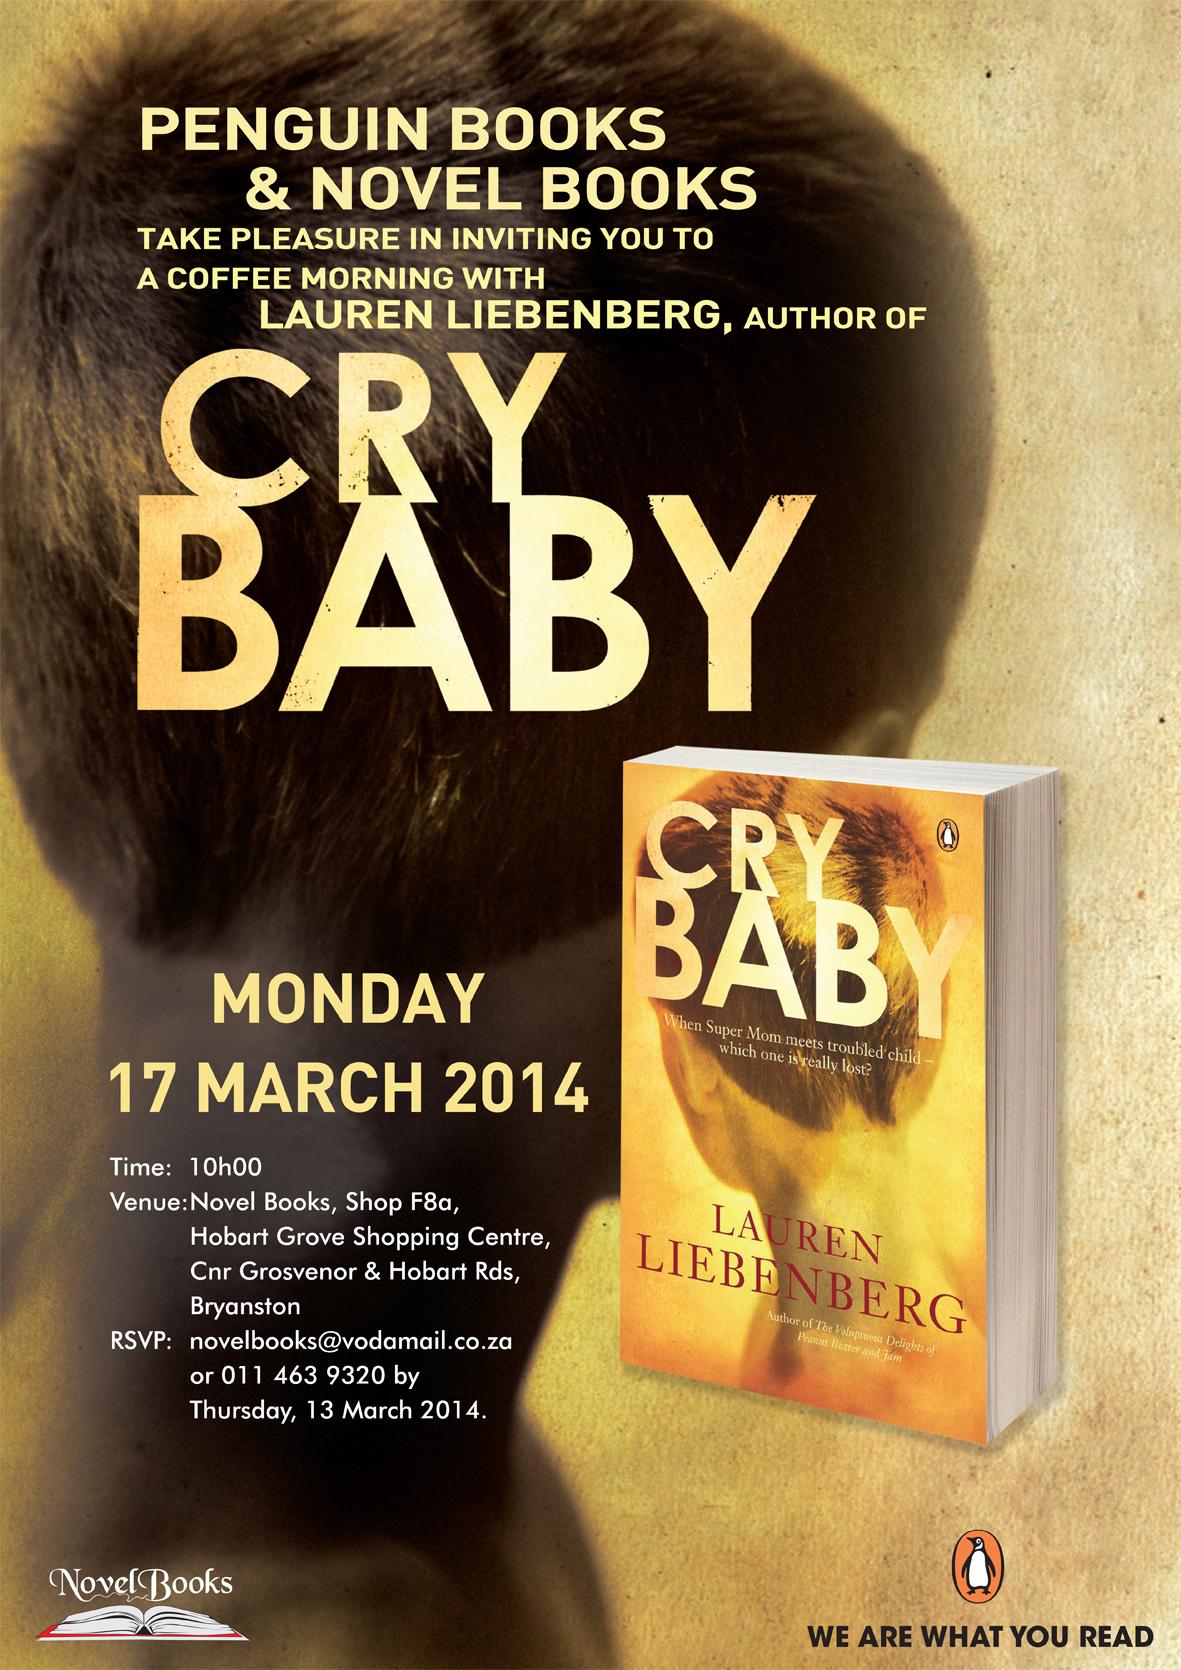 Lauren Liebenberg's book launch for Cry Baby